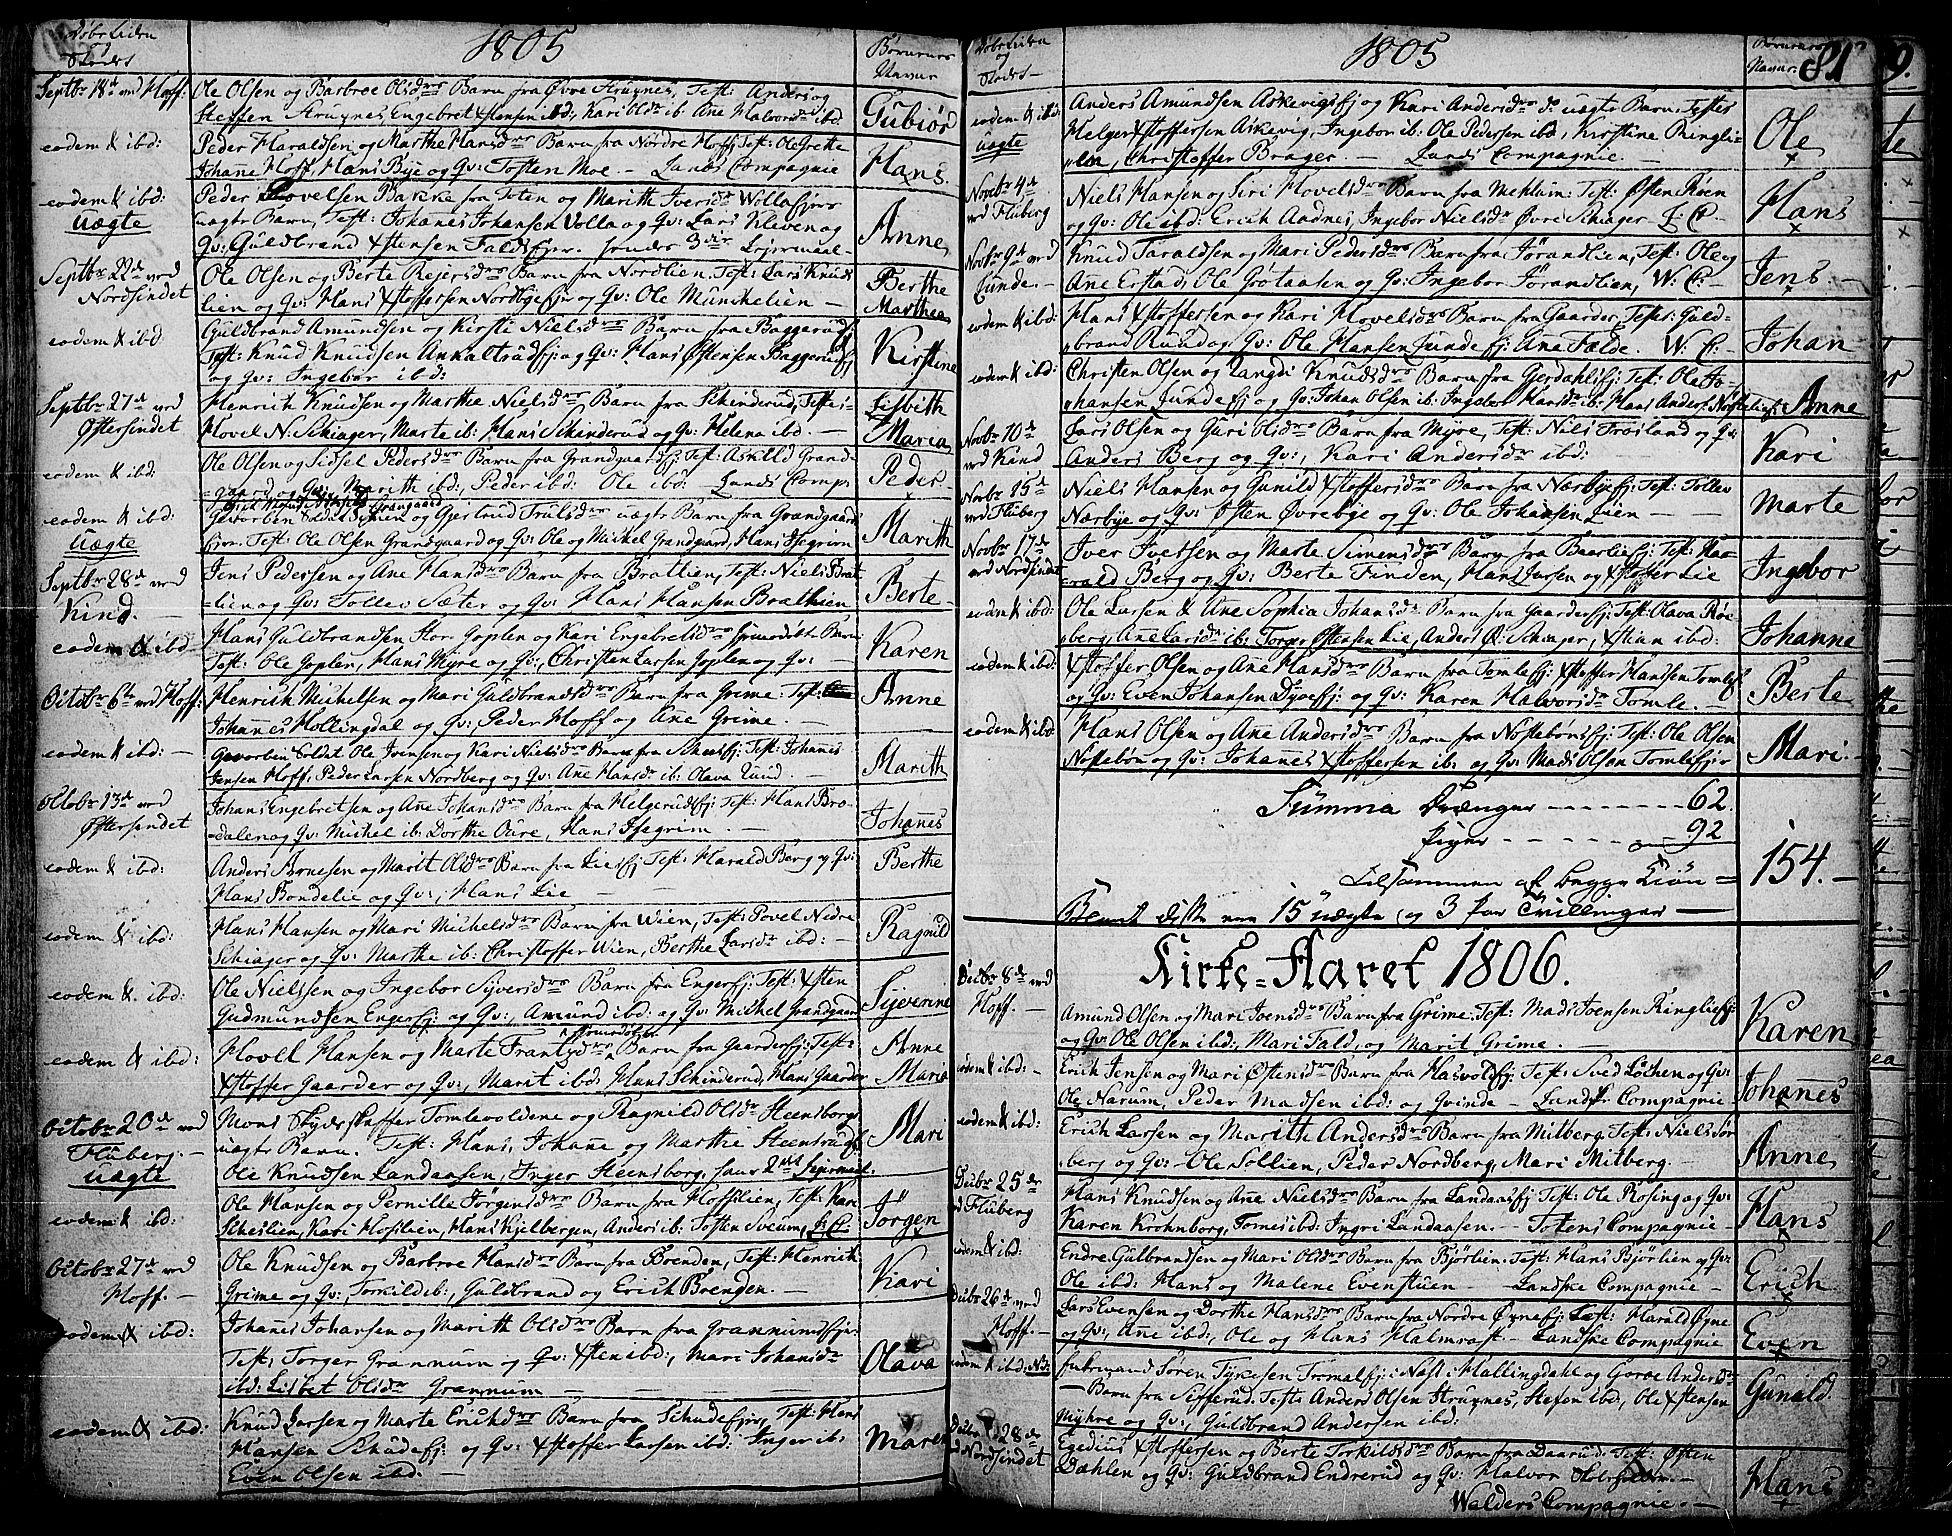 SAH, Land prestekontor, Ministerialbok nr. 6, 1784-1813, s. 81